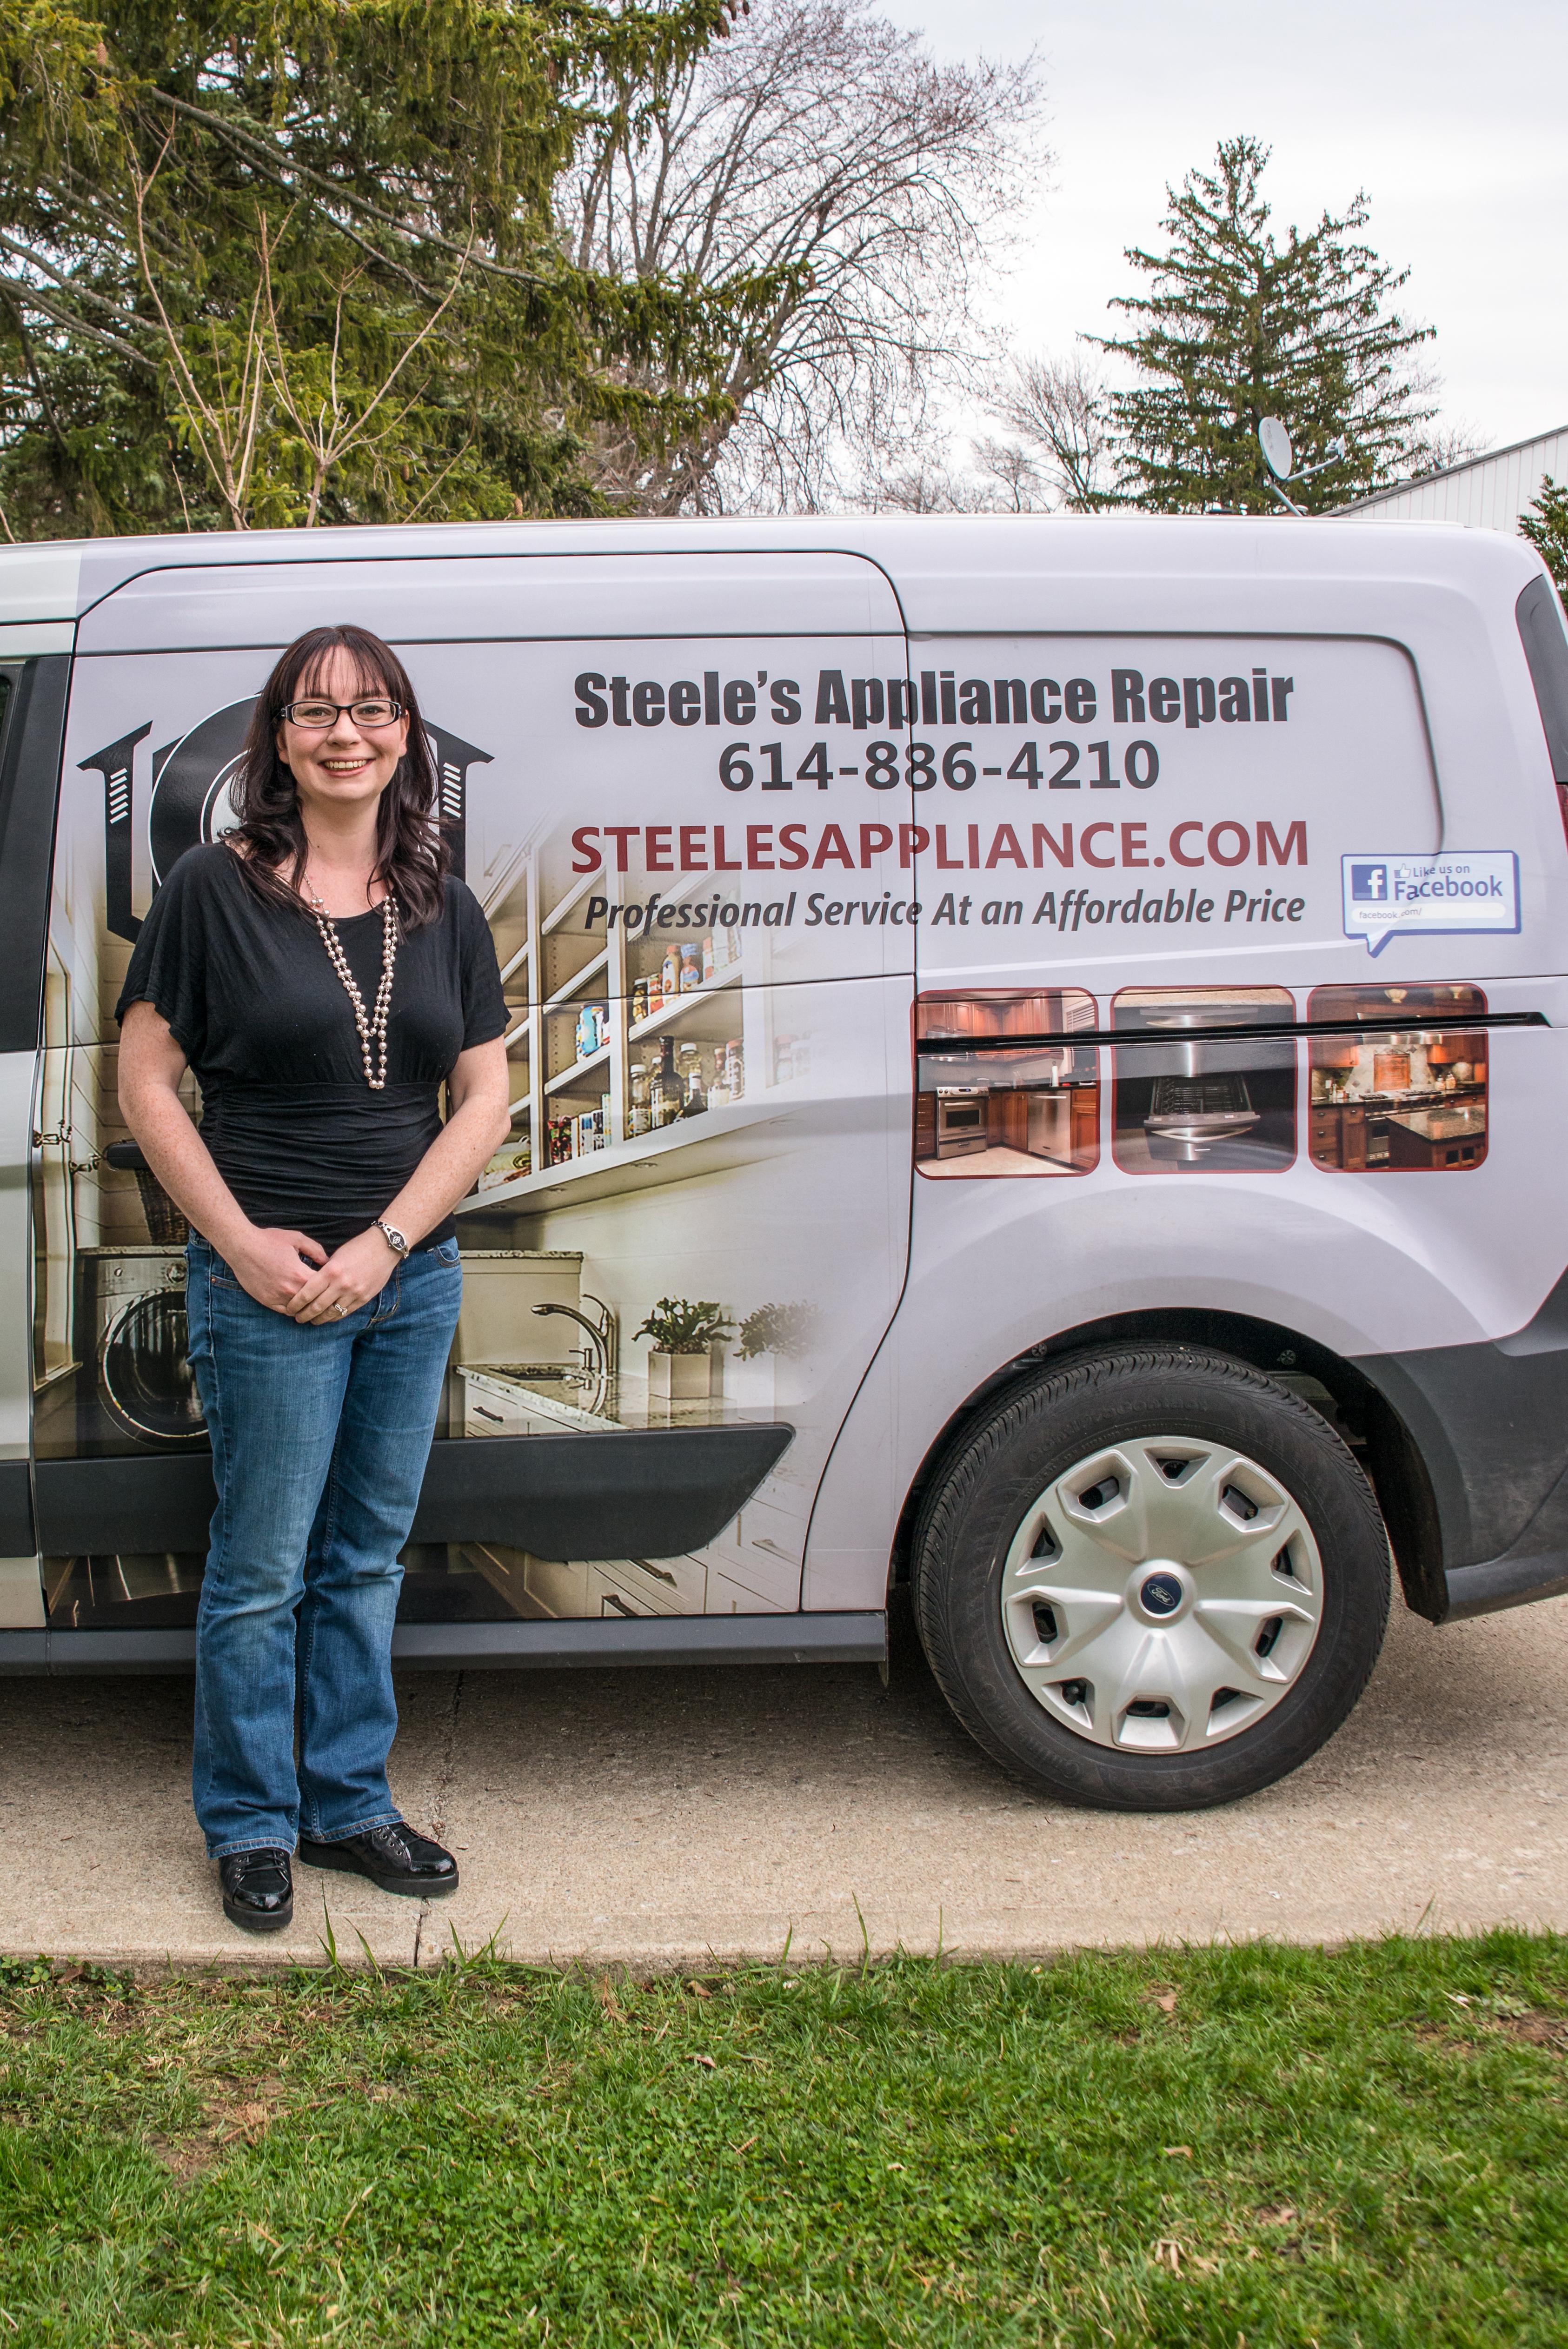 Steele's Appliance & Home Repair Service LLC image 2